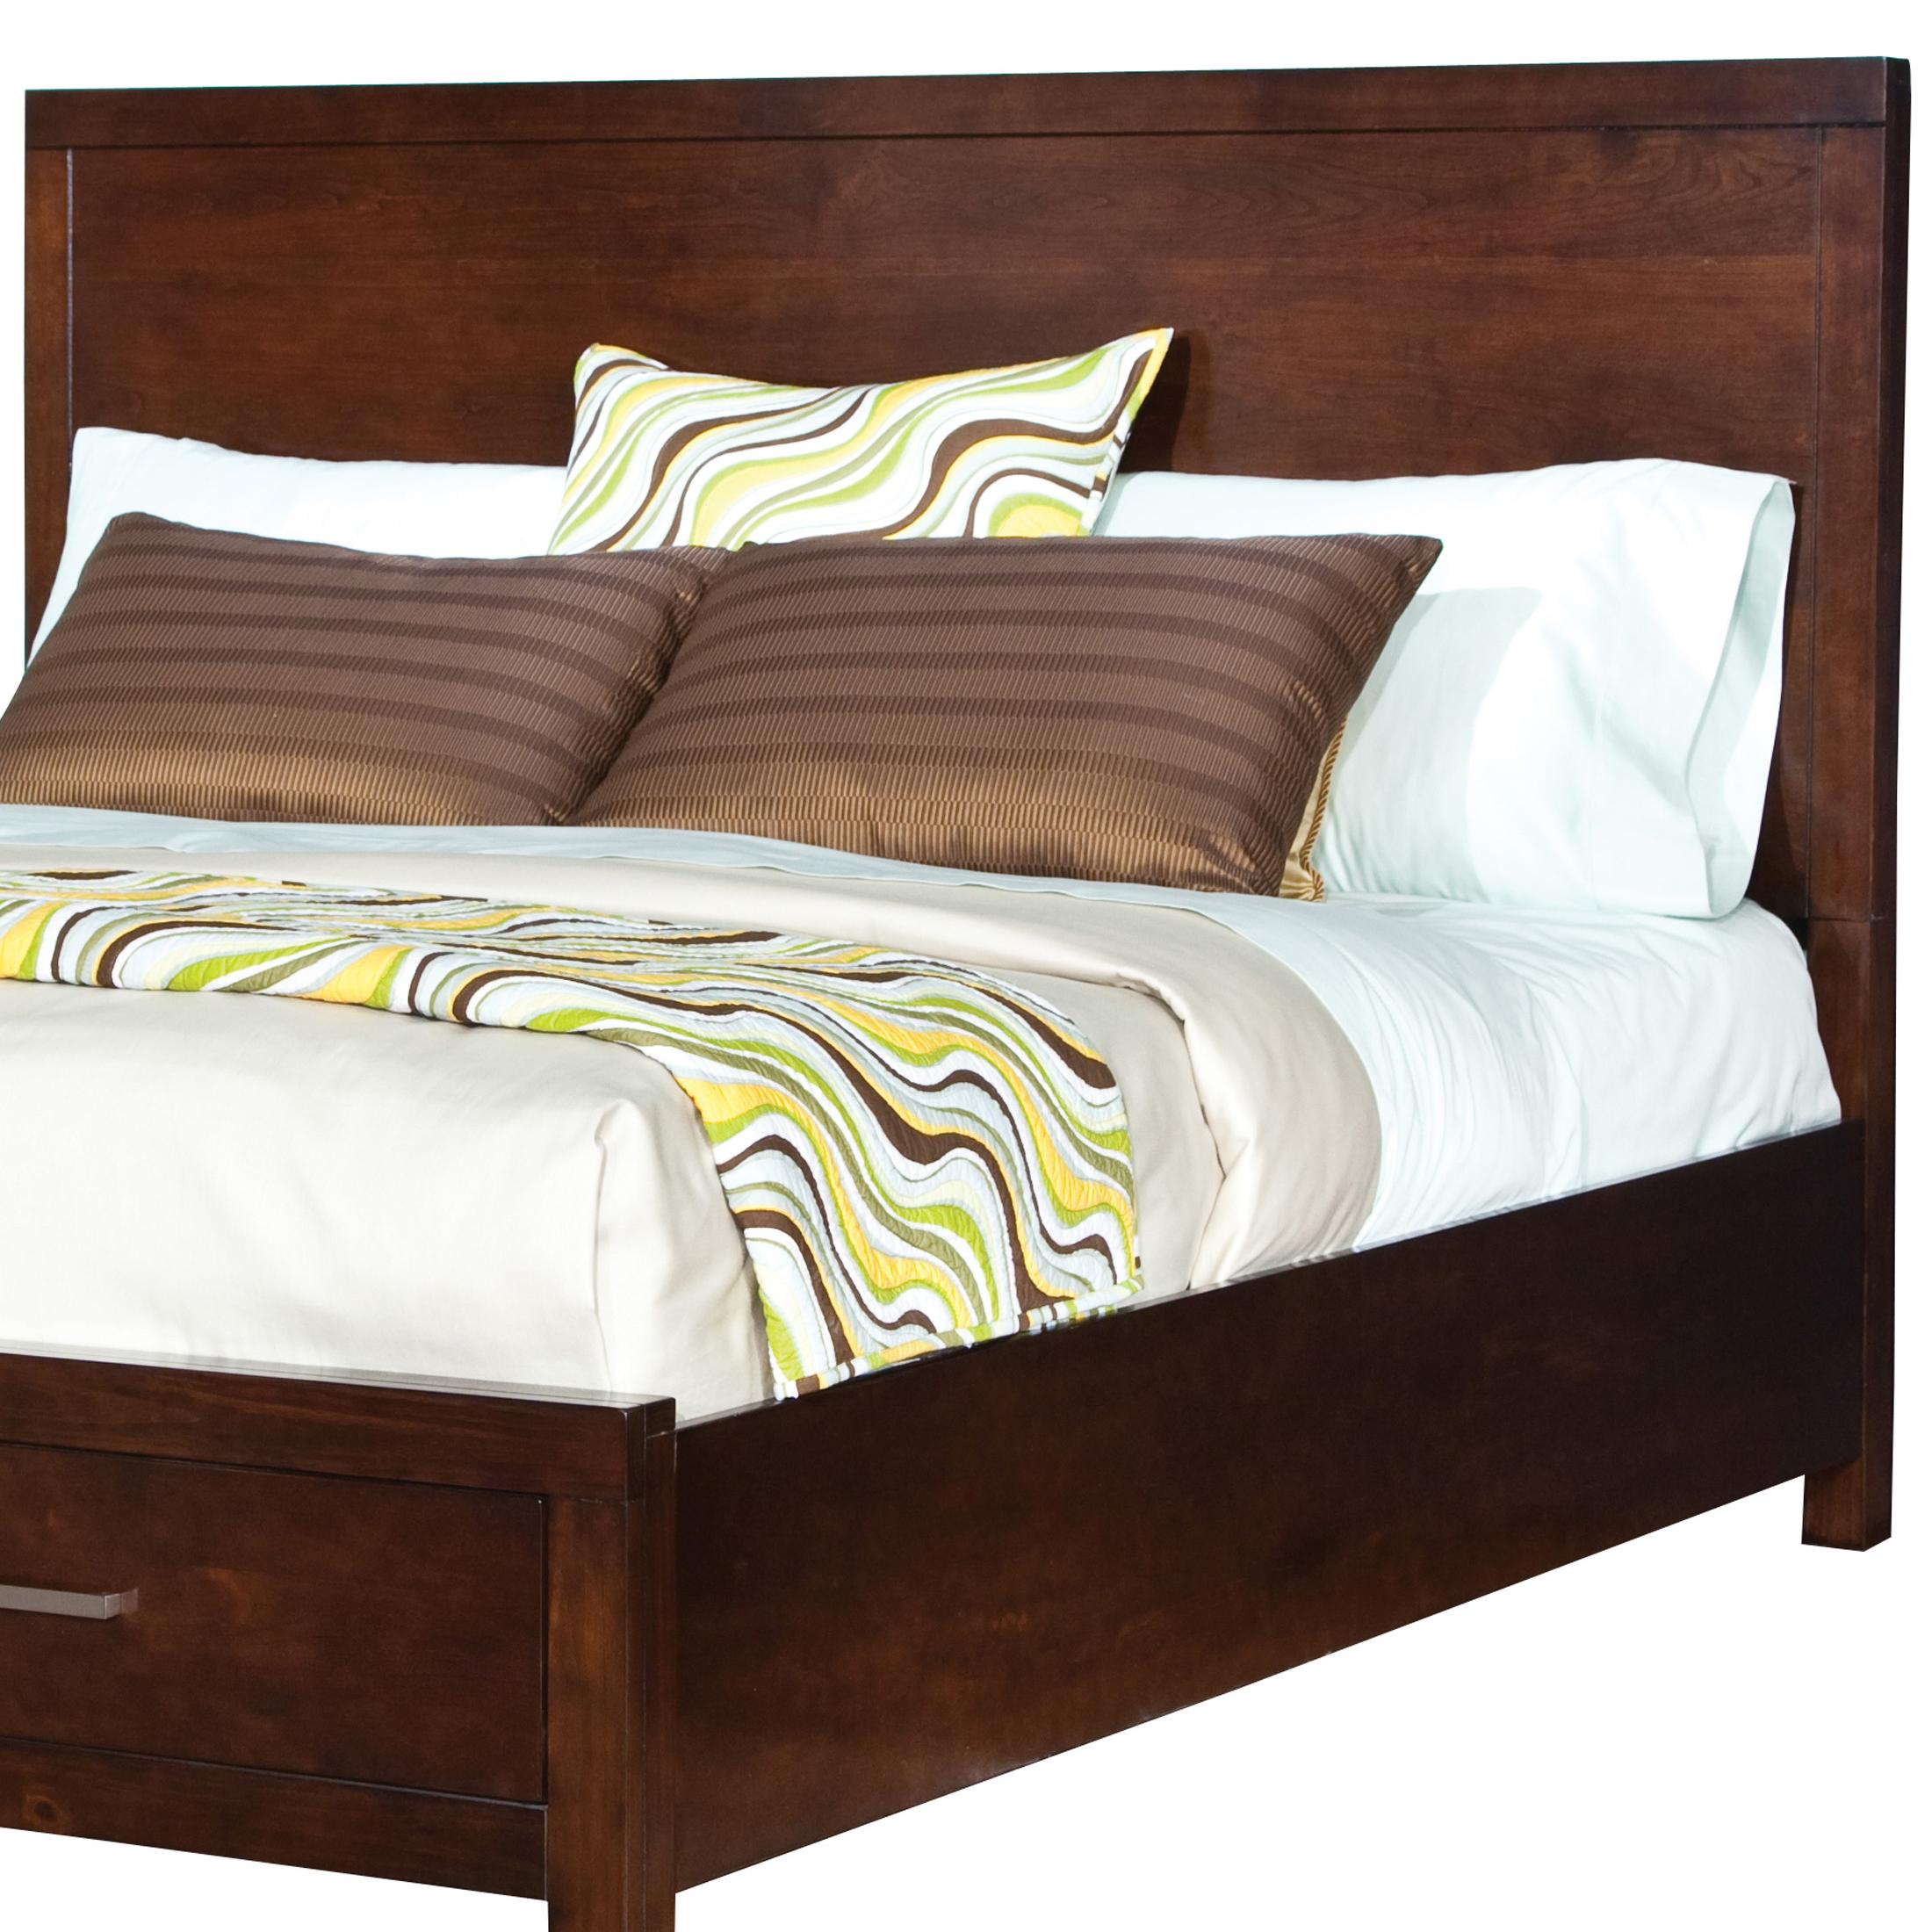 Standard Furniture Metro Full/Queen Panel Headboard                 - Item Number: 87951